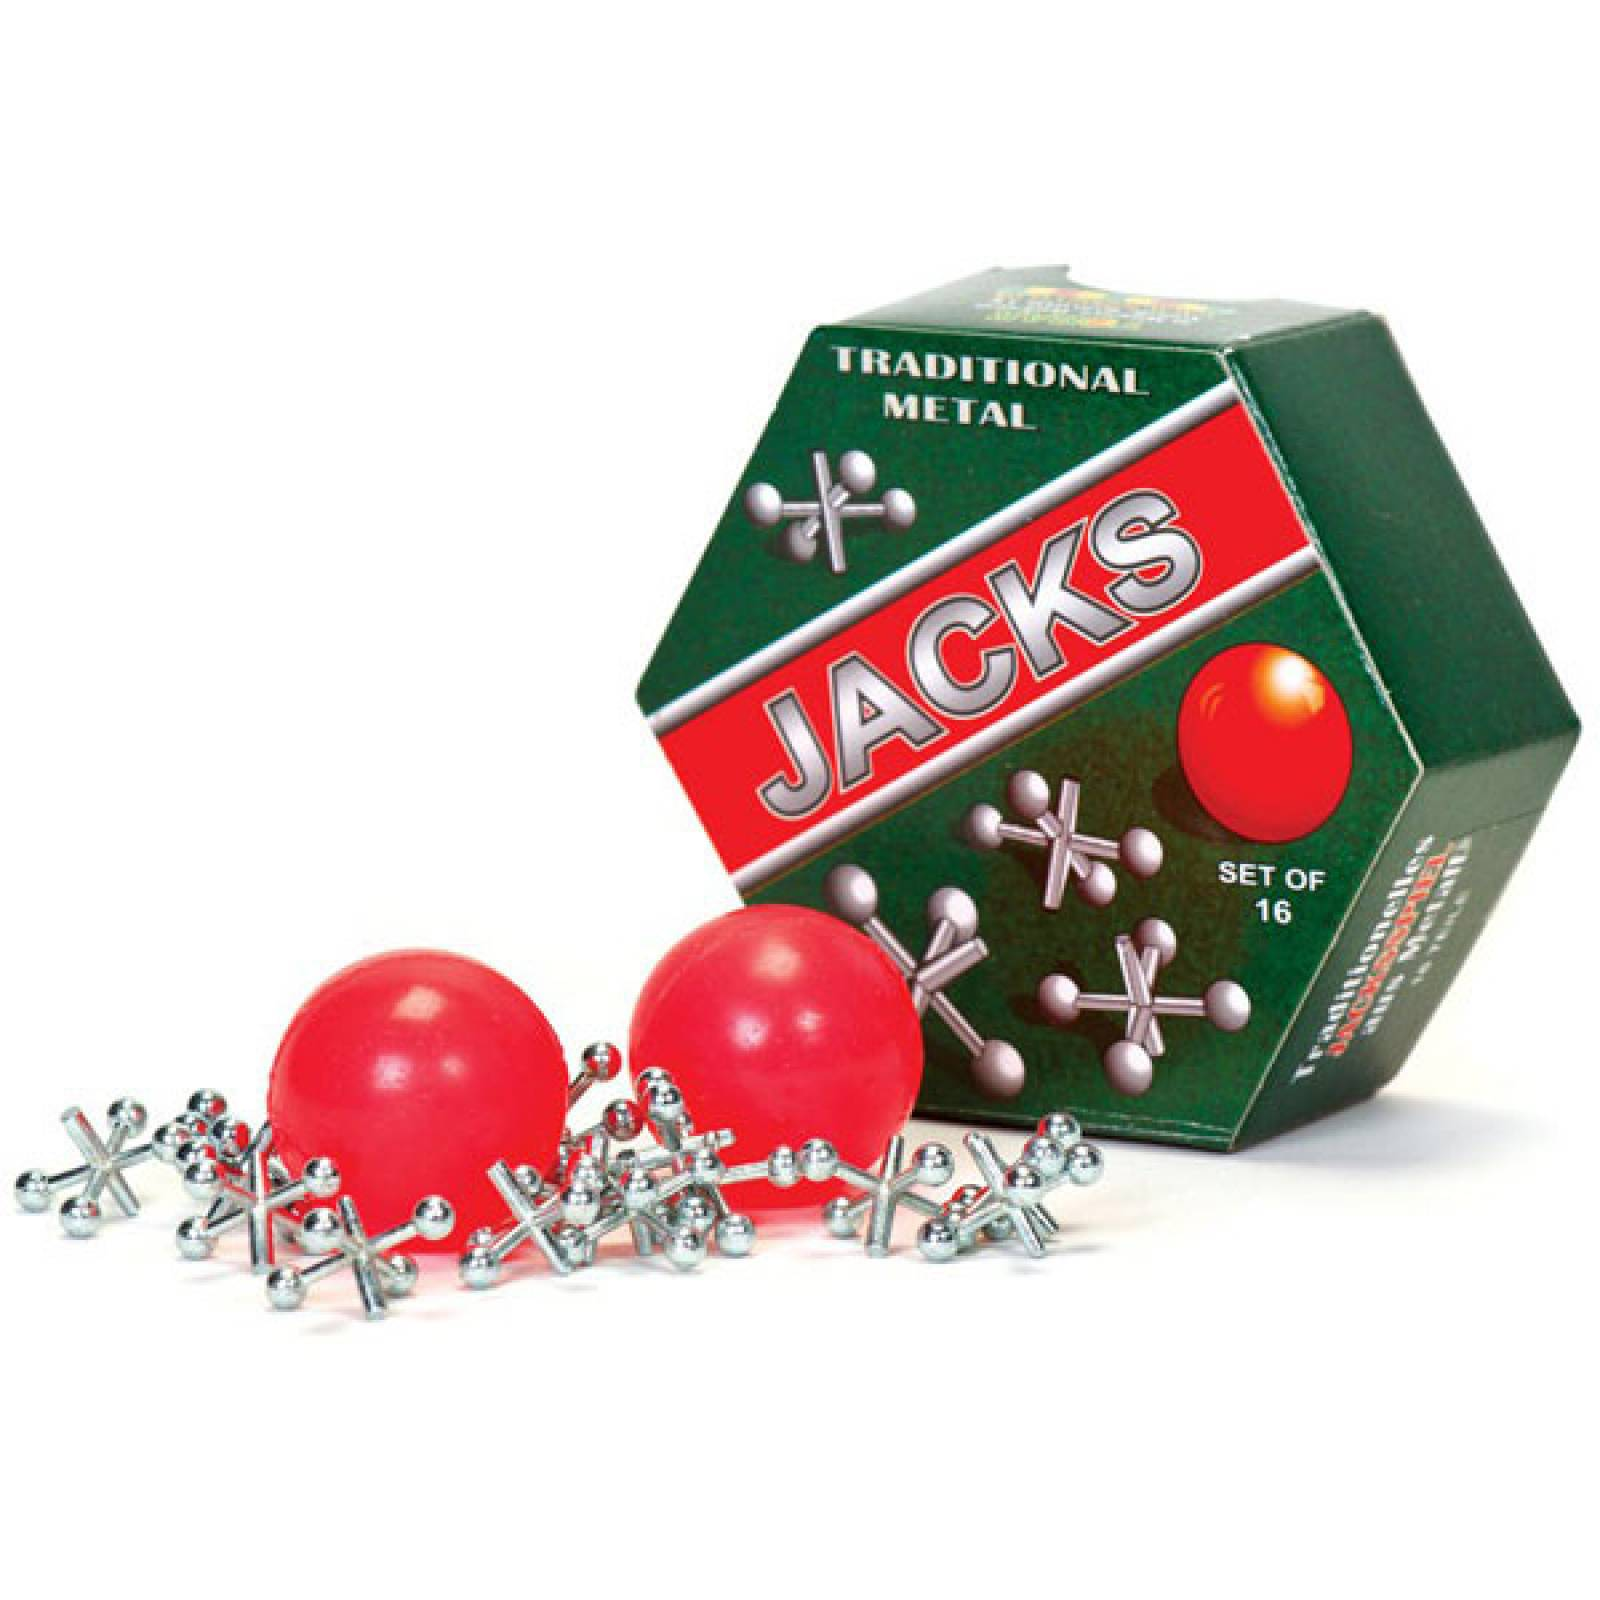 Boxed Set Of Traditional Jacks